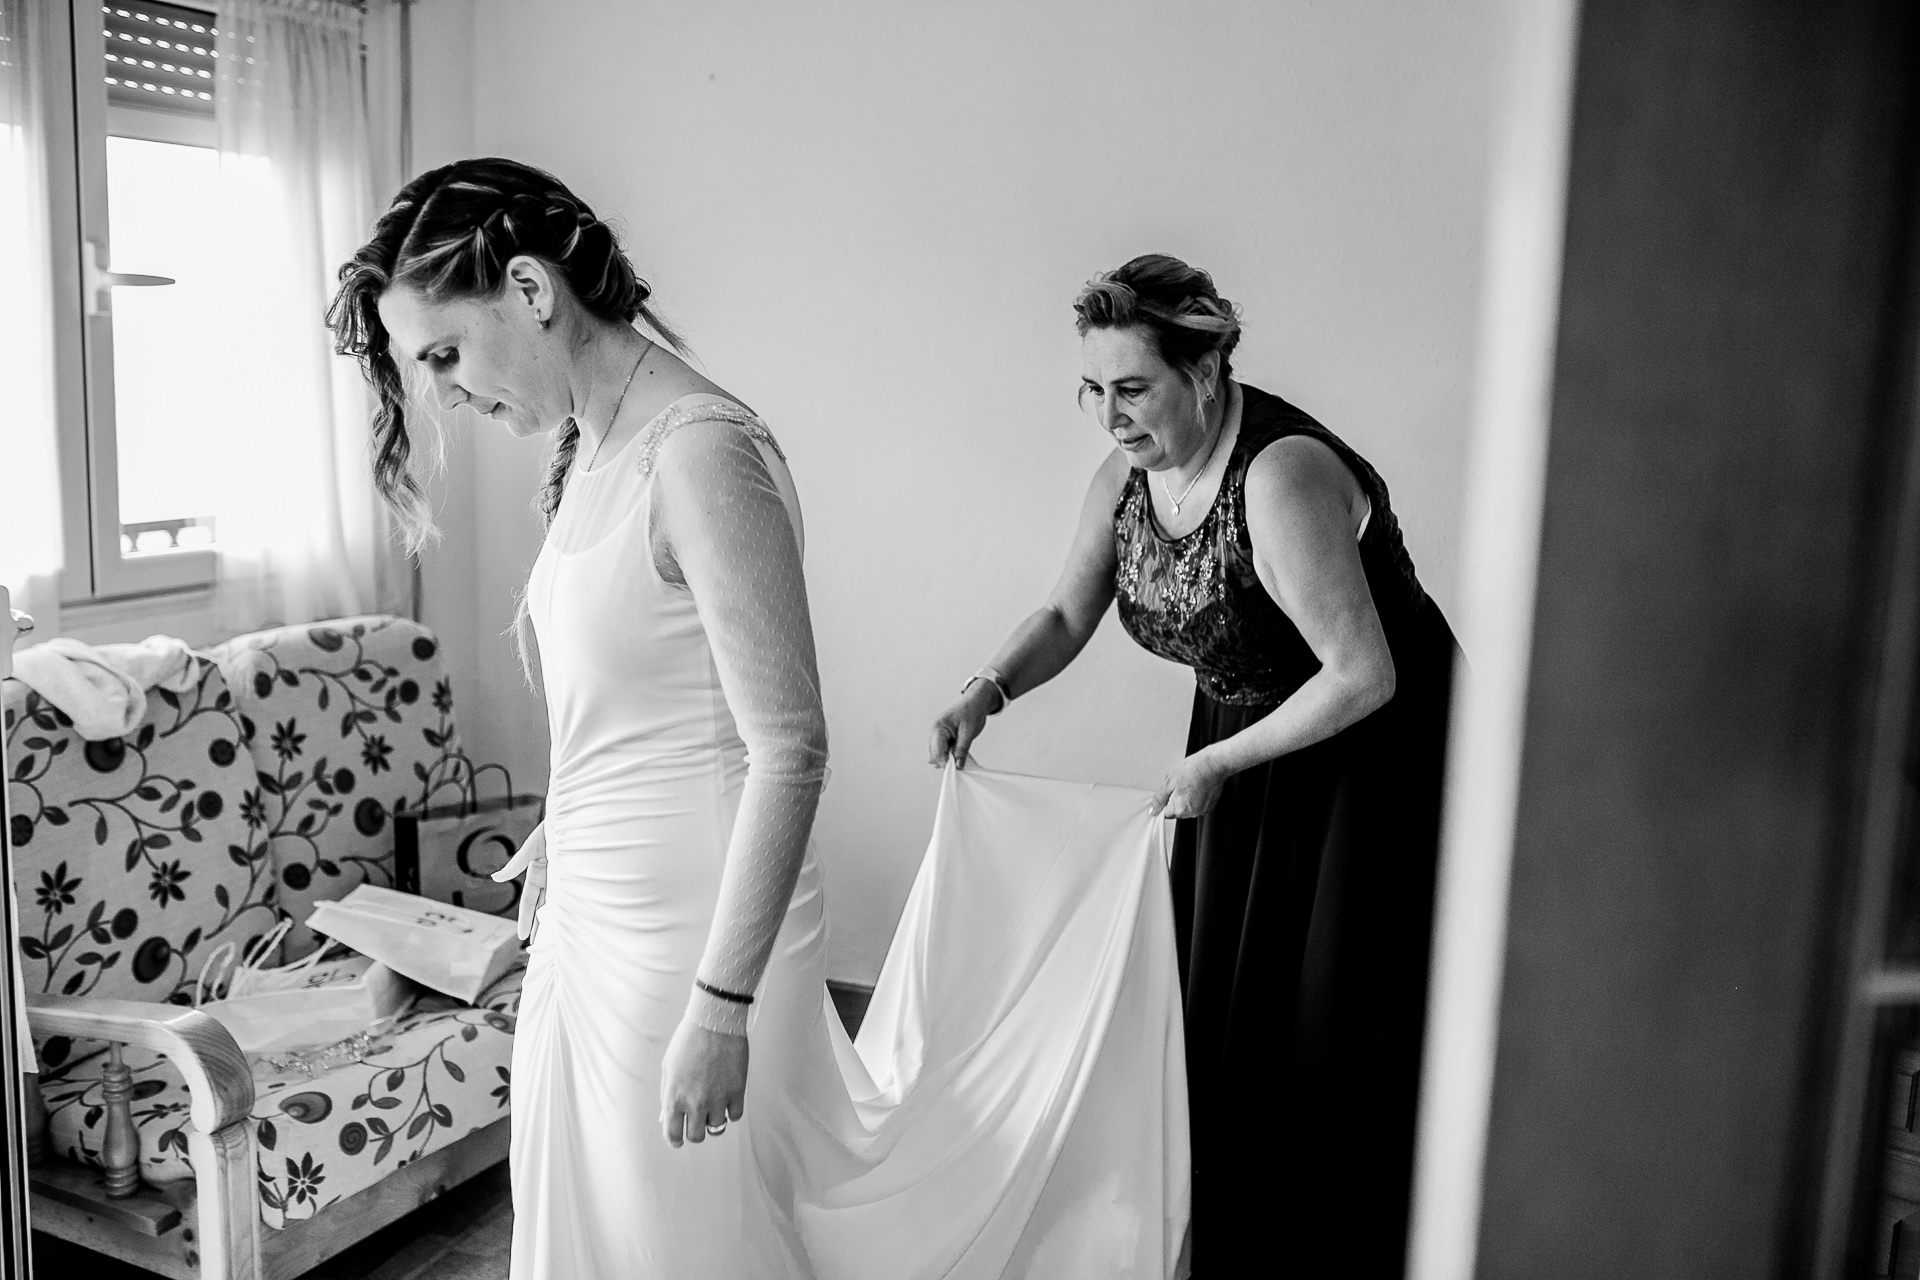 boda civil sagardotegi sidrería arizia zarautz 120719